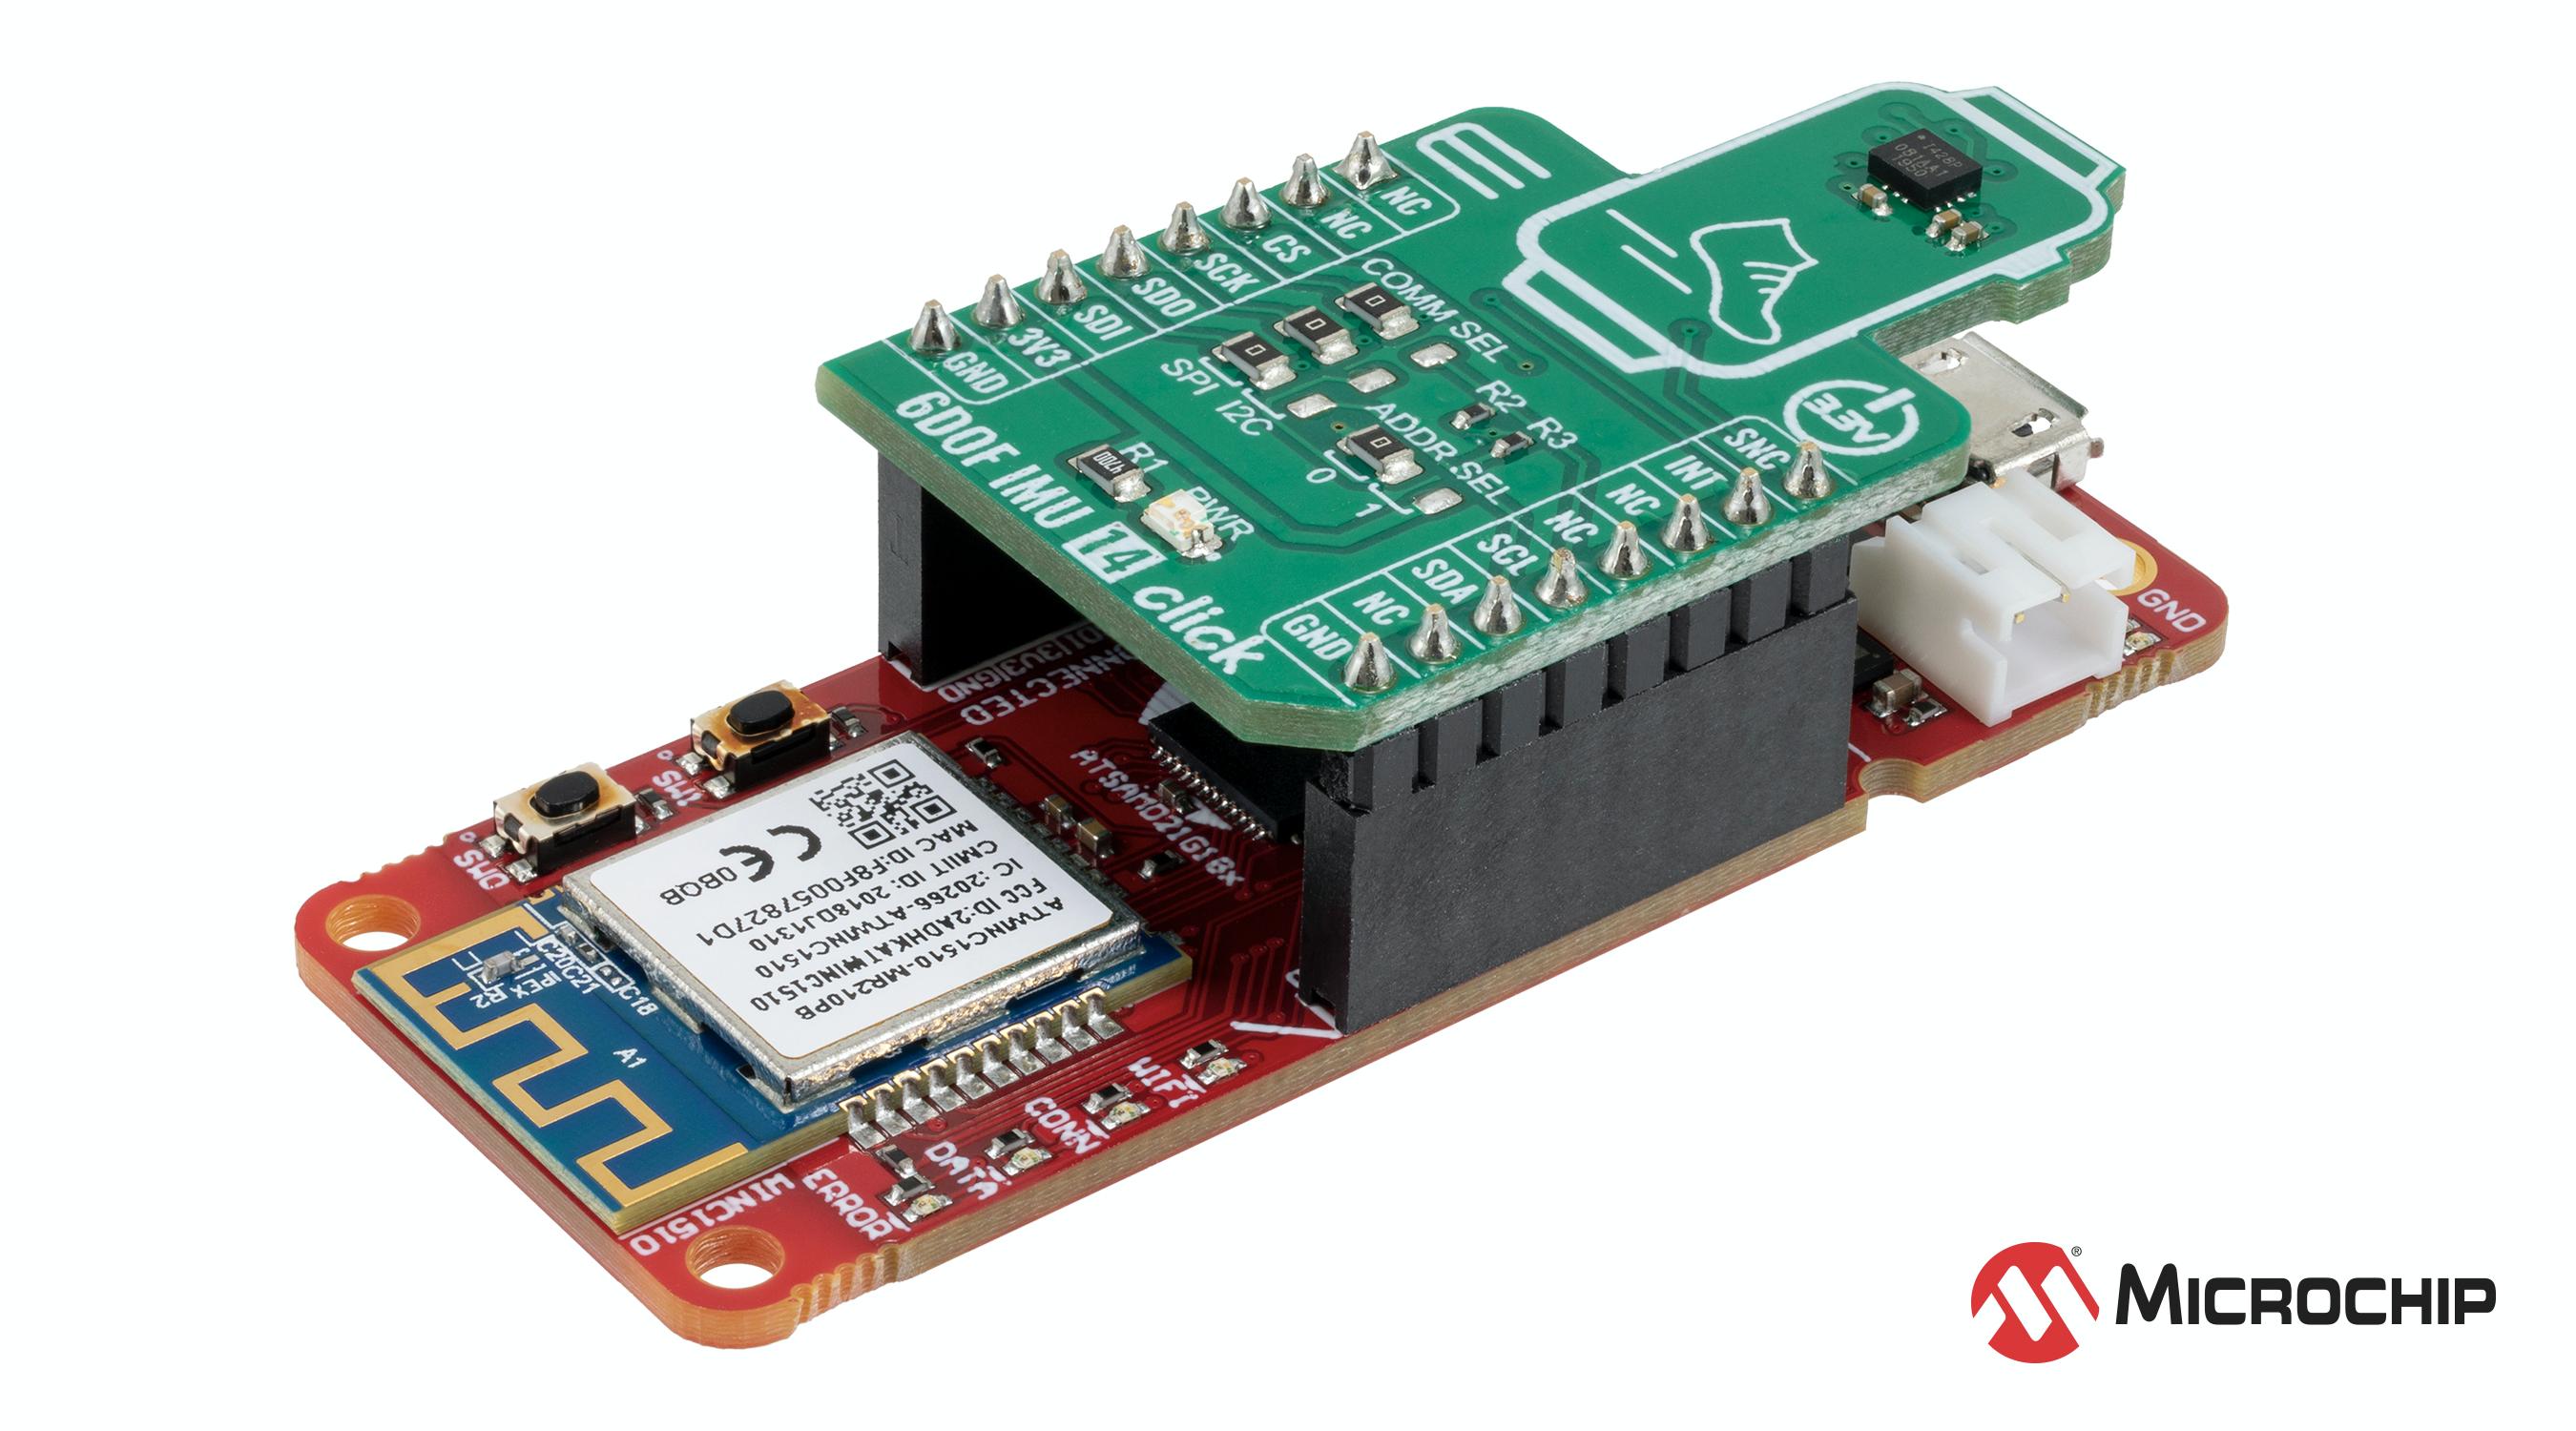 Microchip与机器学习软件领军企业合作,利用32位单片机 简化边缘人工智能设计